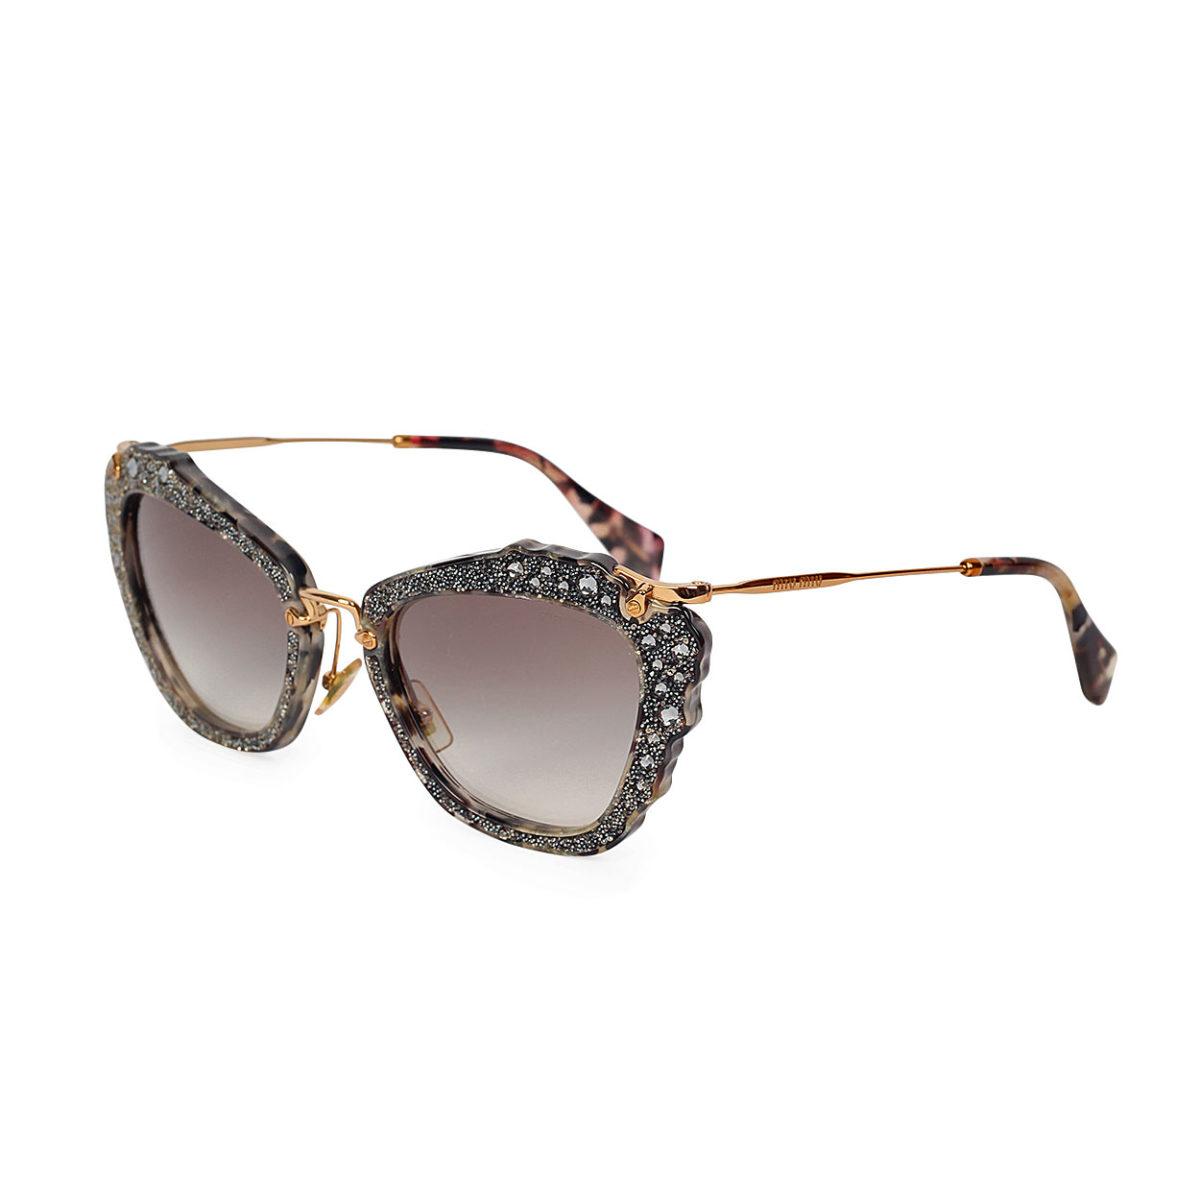 ec66b4d804c5 MIU MIU Embellished Cat Eye Sunglasses Blue